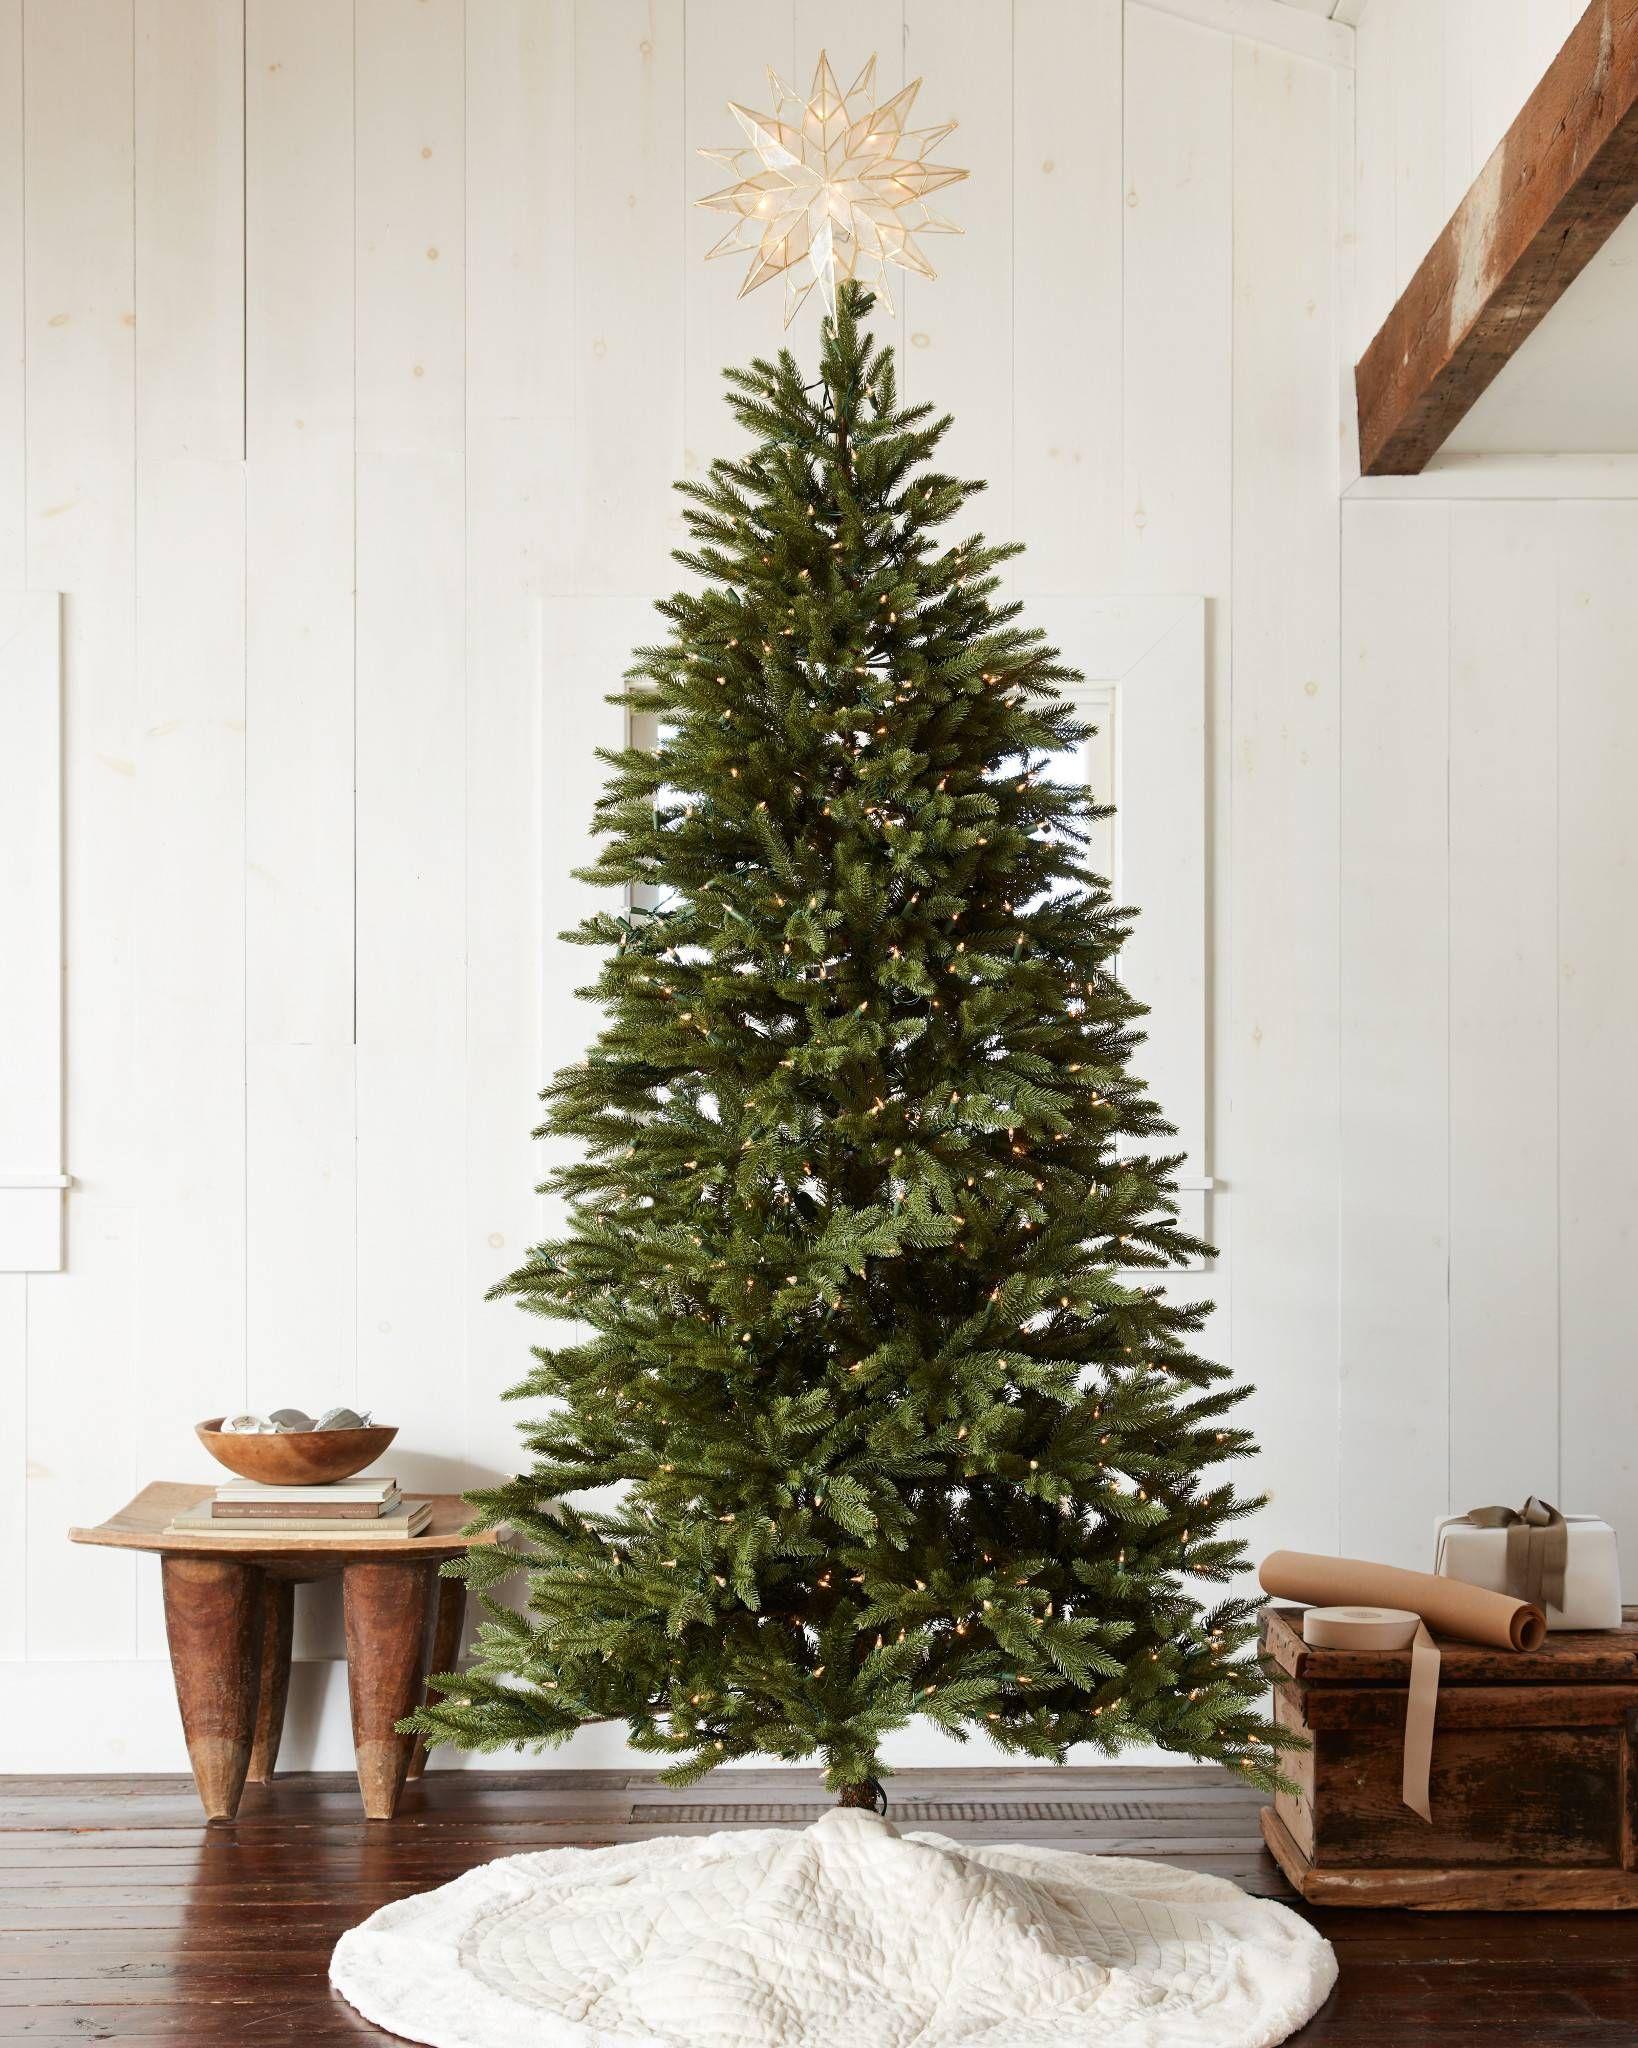 Silverado Slim Artificial Christmas Trees Balsam Hill Slim Artificial Christmas Trees Best Artificial Christmas Trees Narrow Christmas Tree